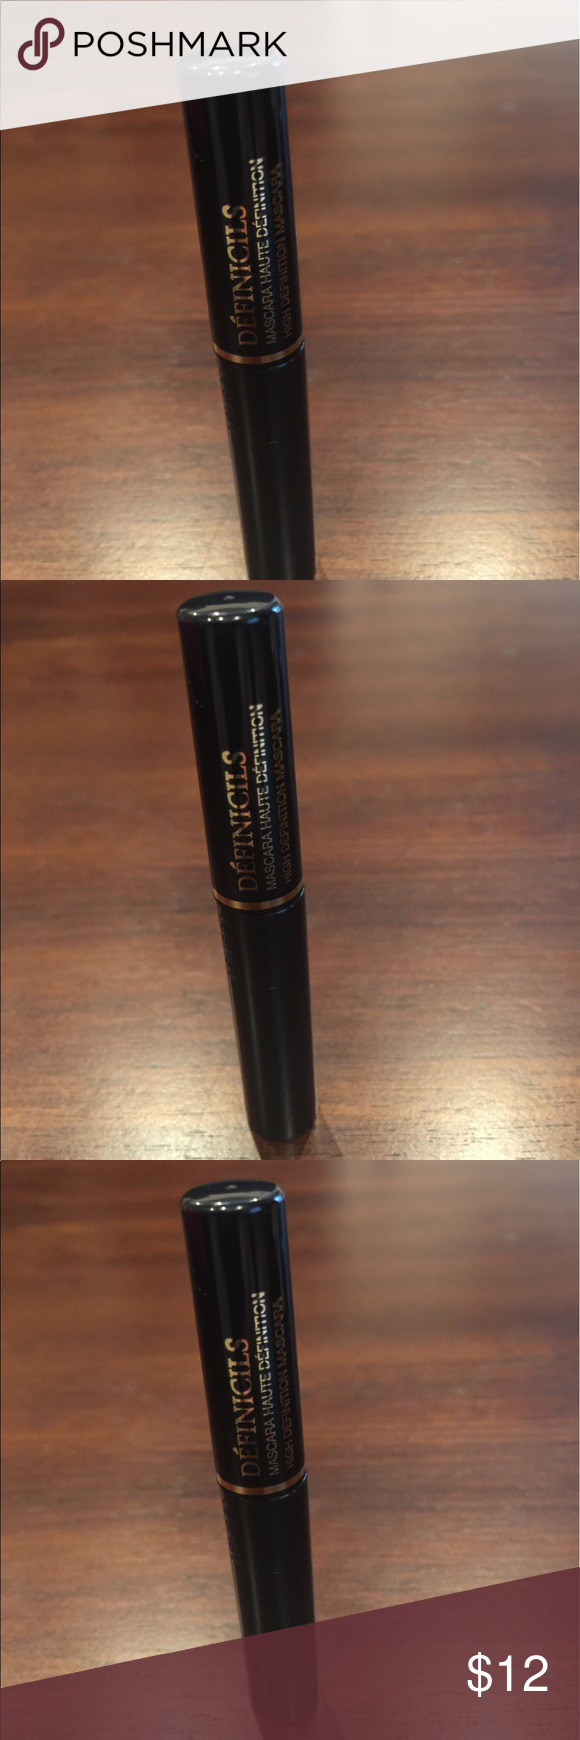 Lancôme Definicils mascara in black High definition